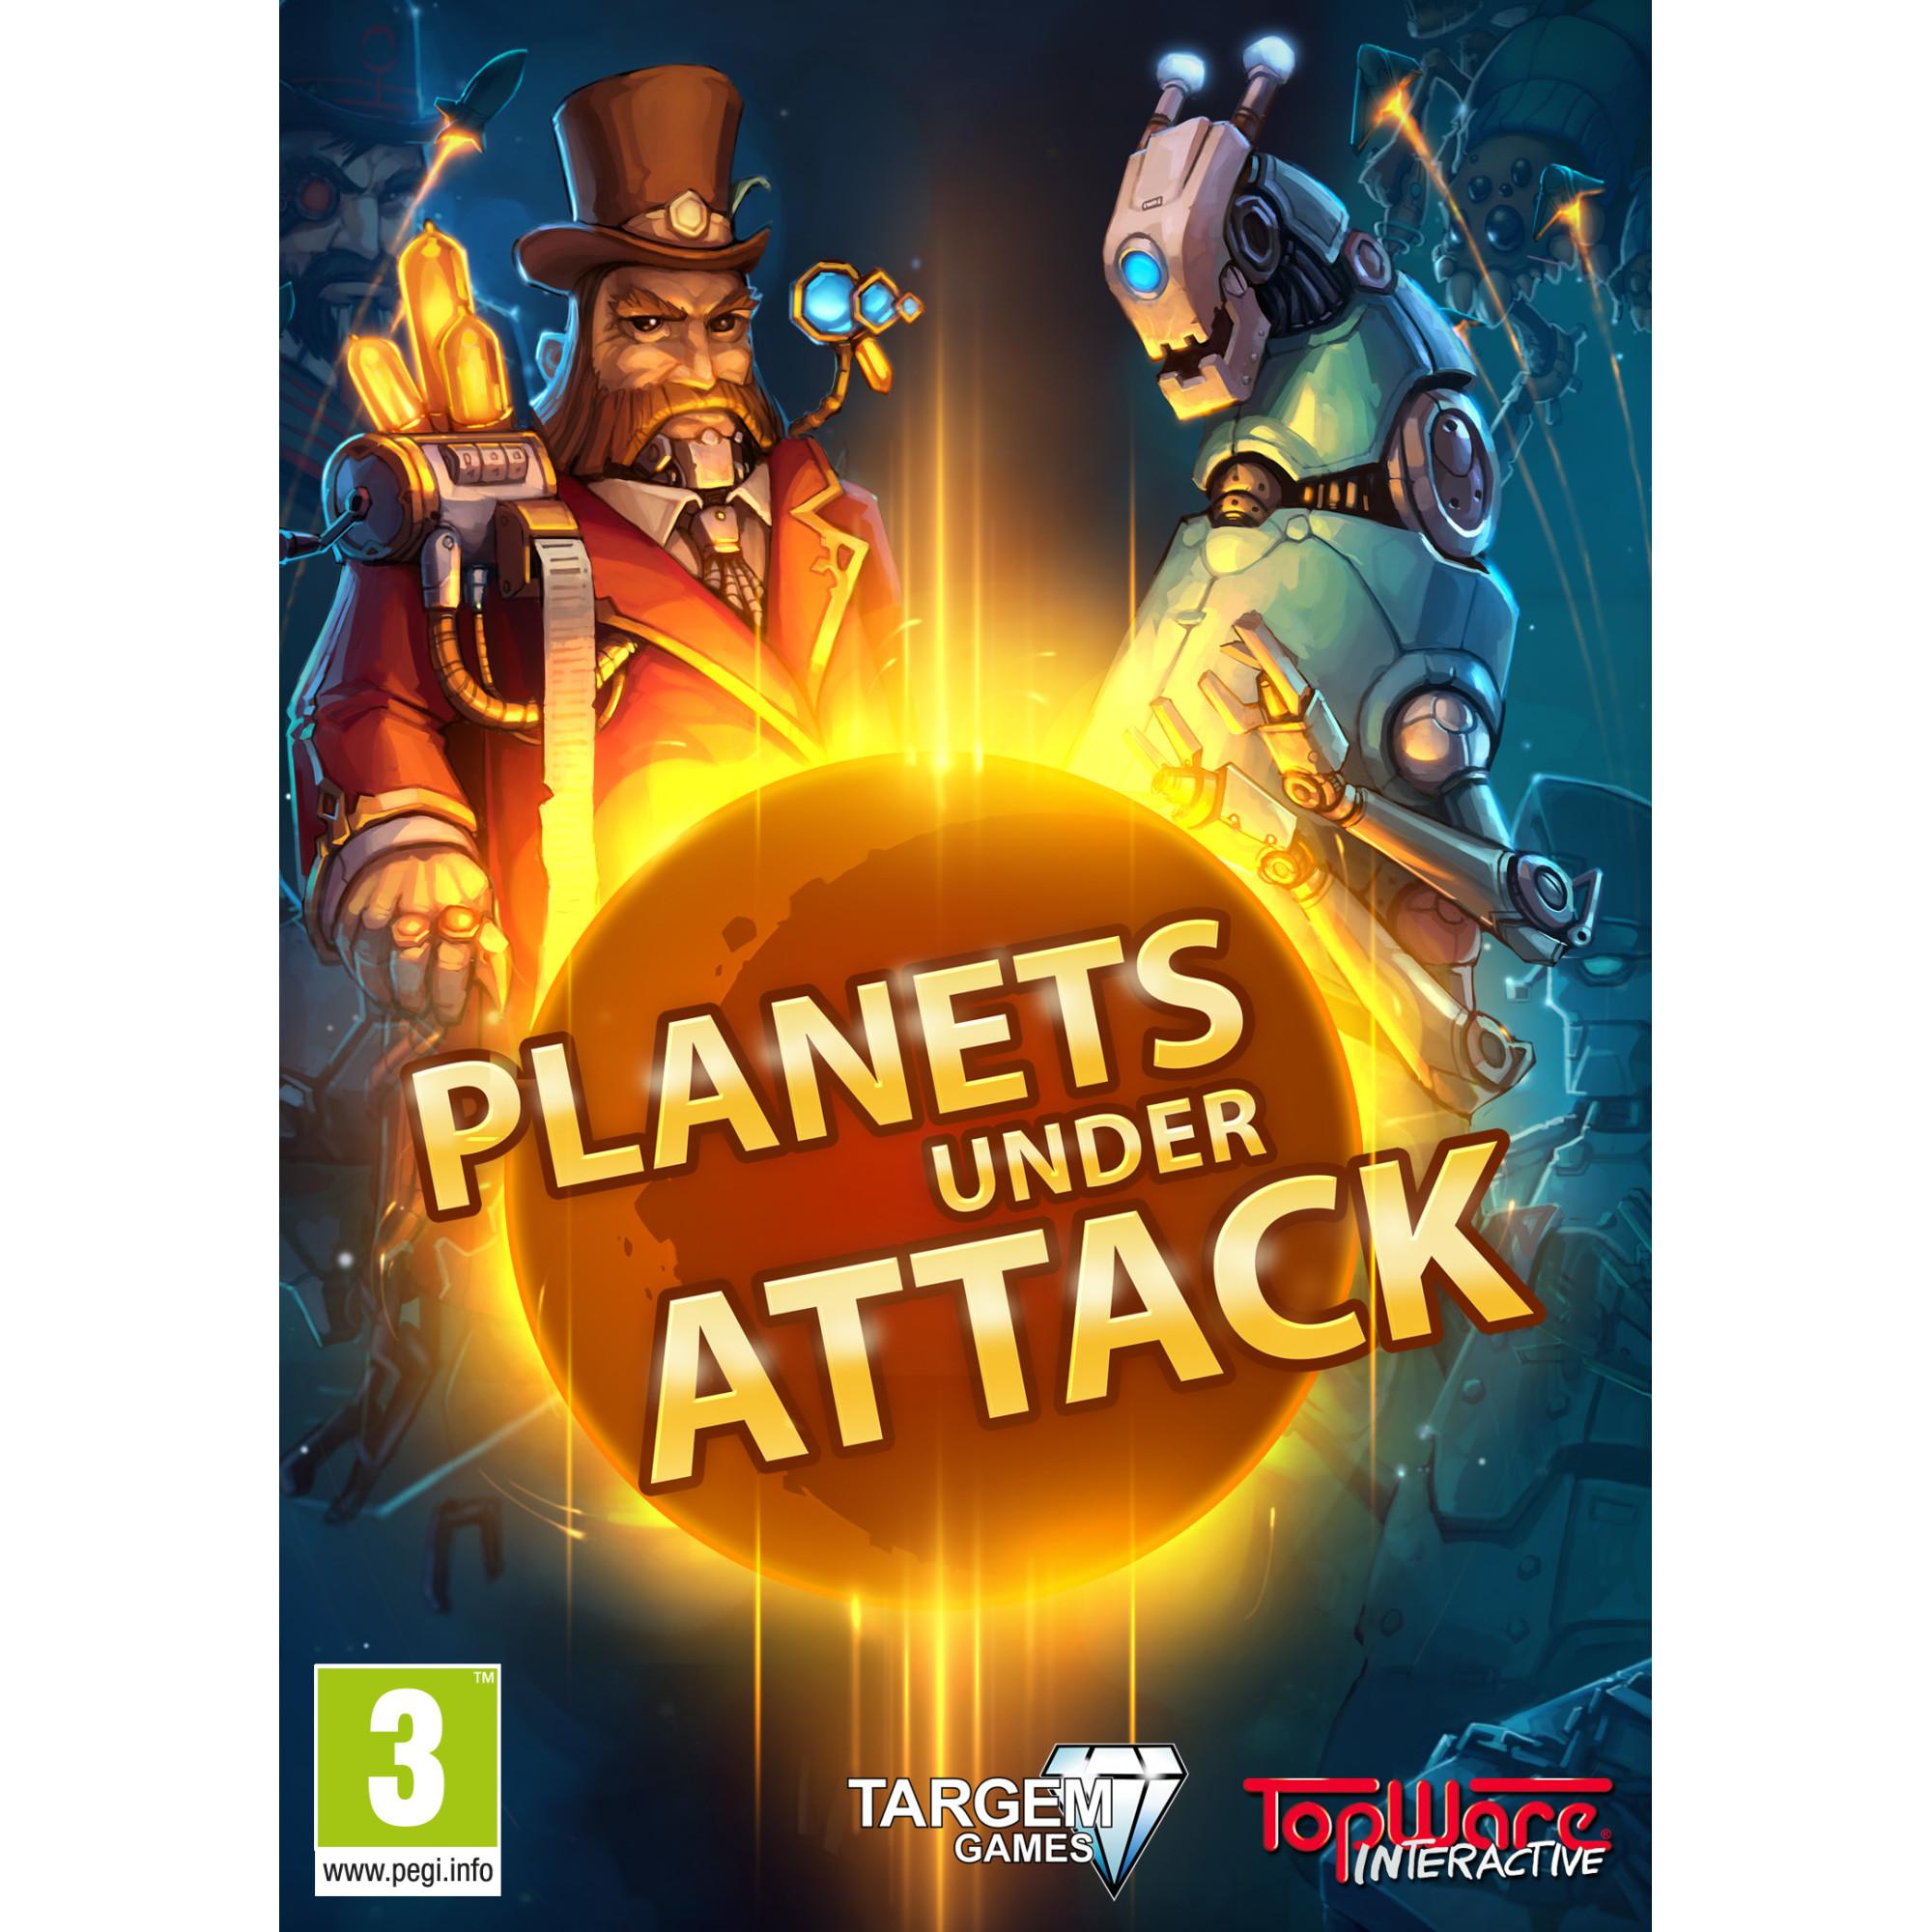 Joc Planets Under Attack Steam Pentru Calculator 0